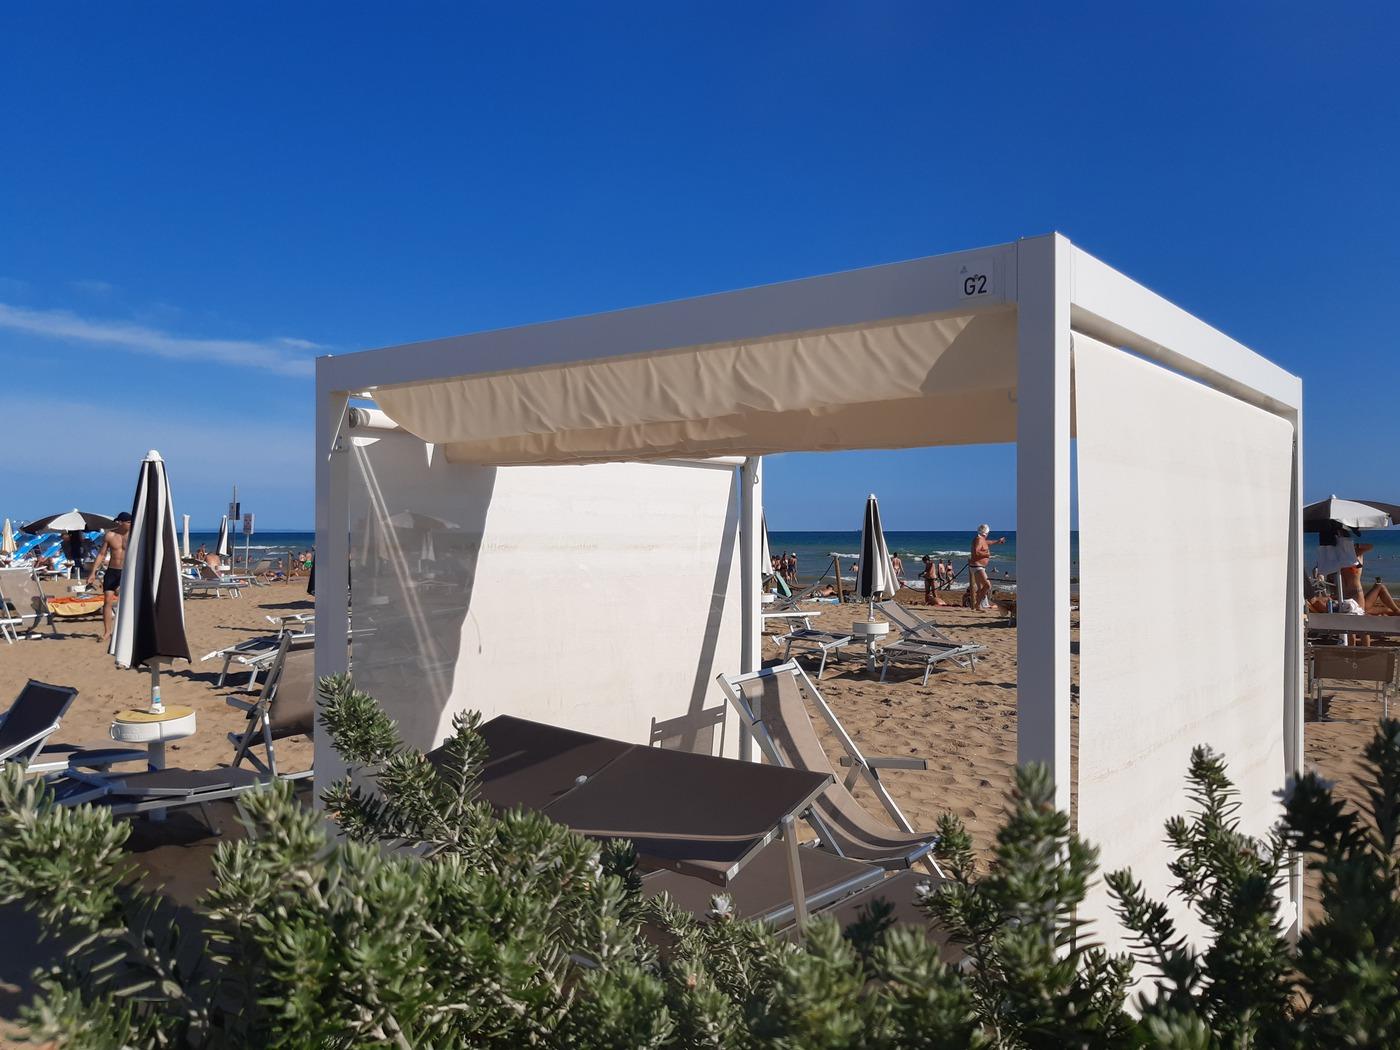 Spiaggia di Bibione, feiner Sandstrand in Venetien